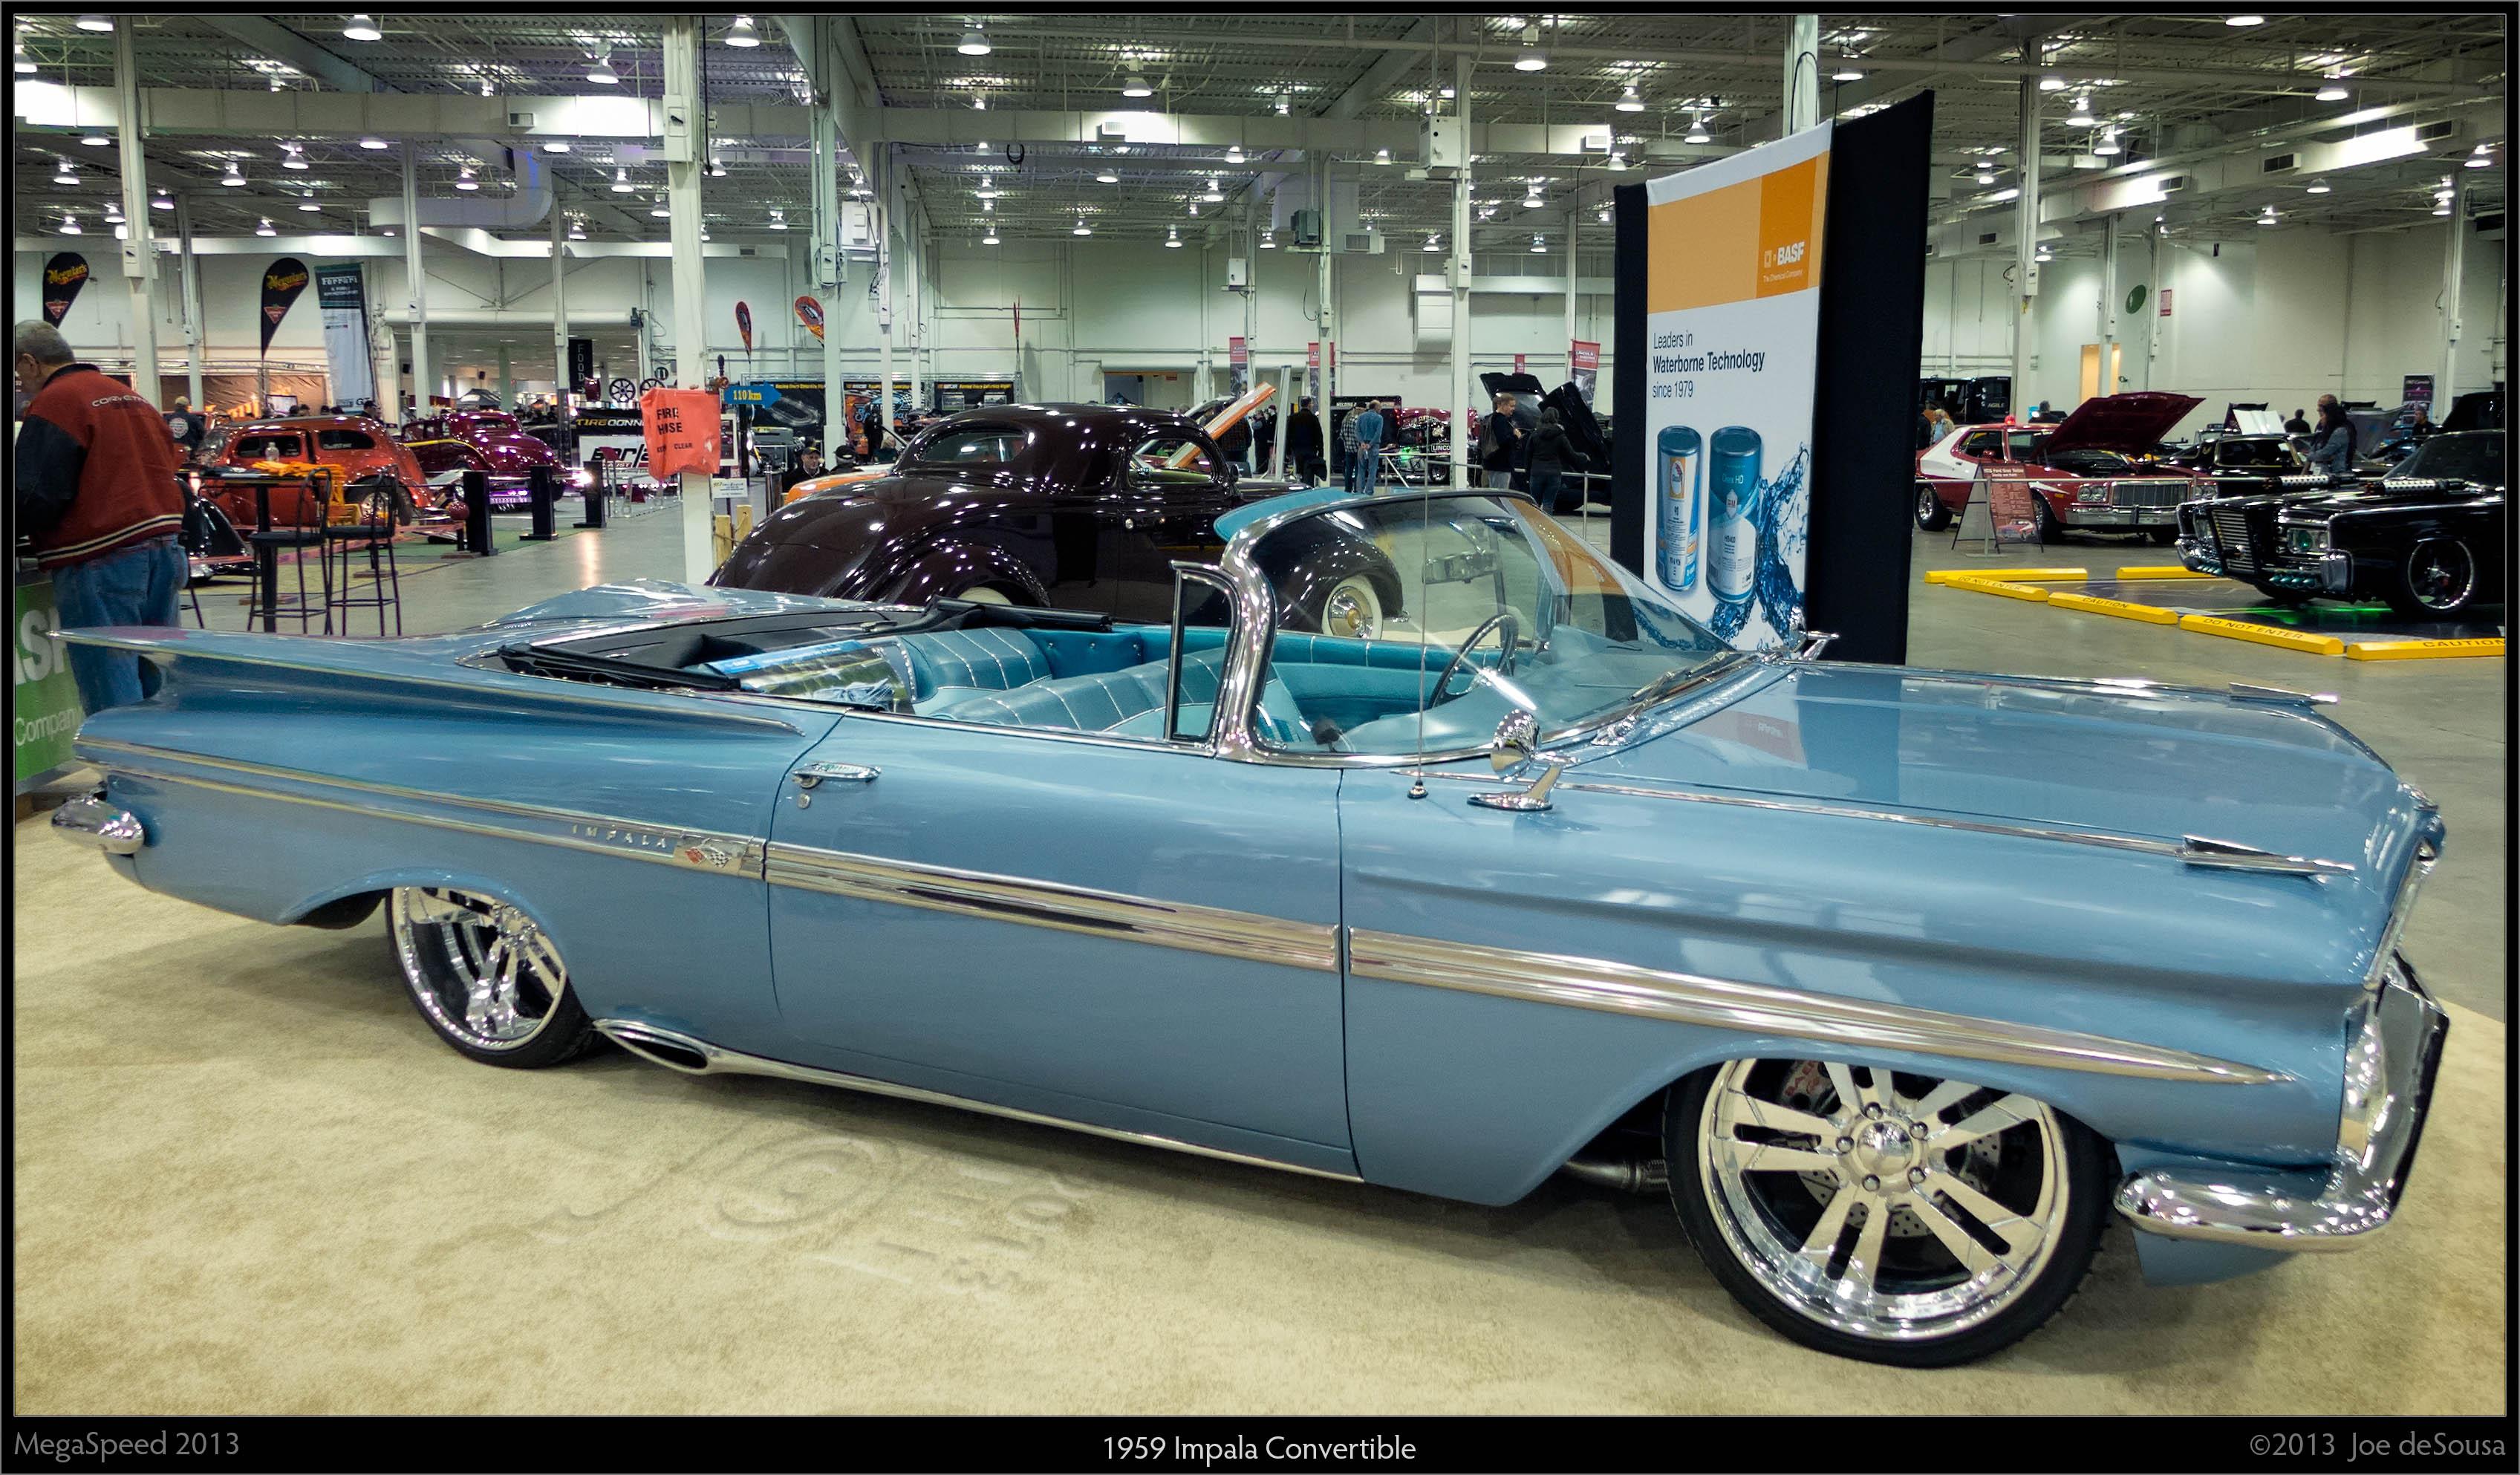 1959 Impala Convertible, 1959, Megaspeed, Tri, Show, HQ Photo